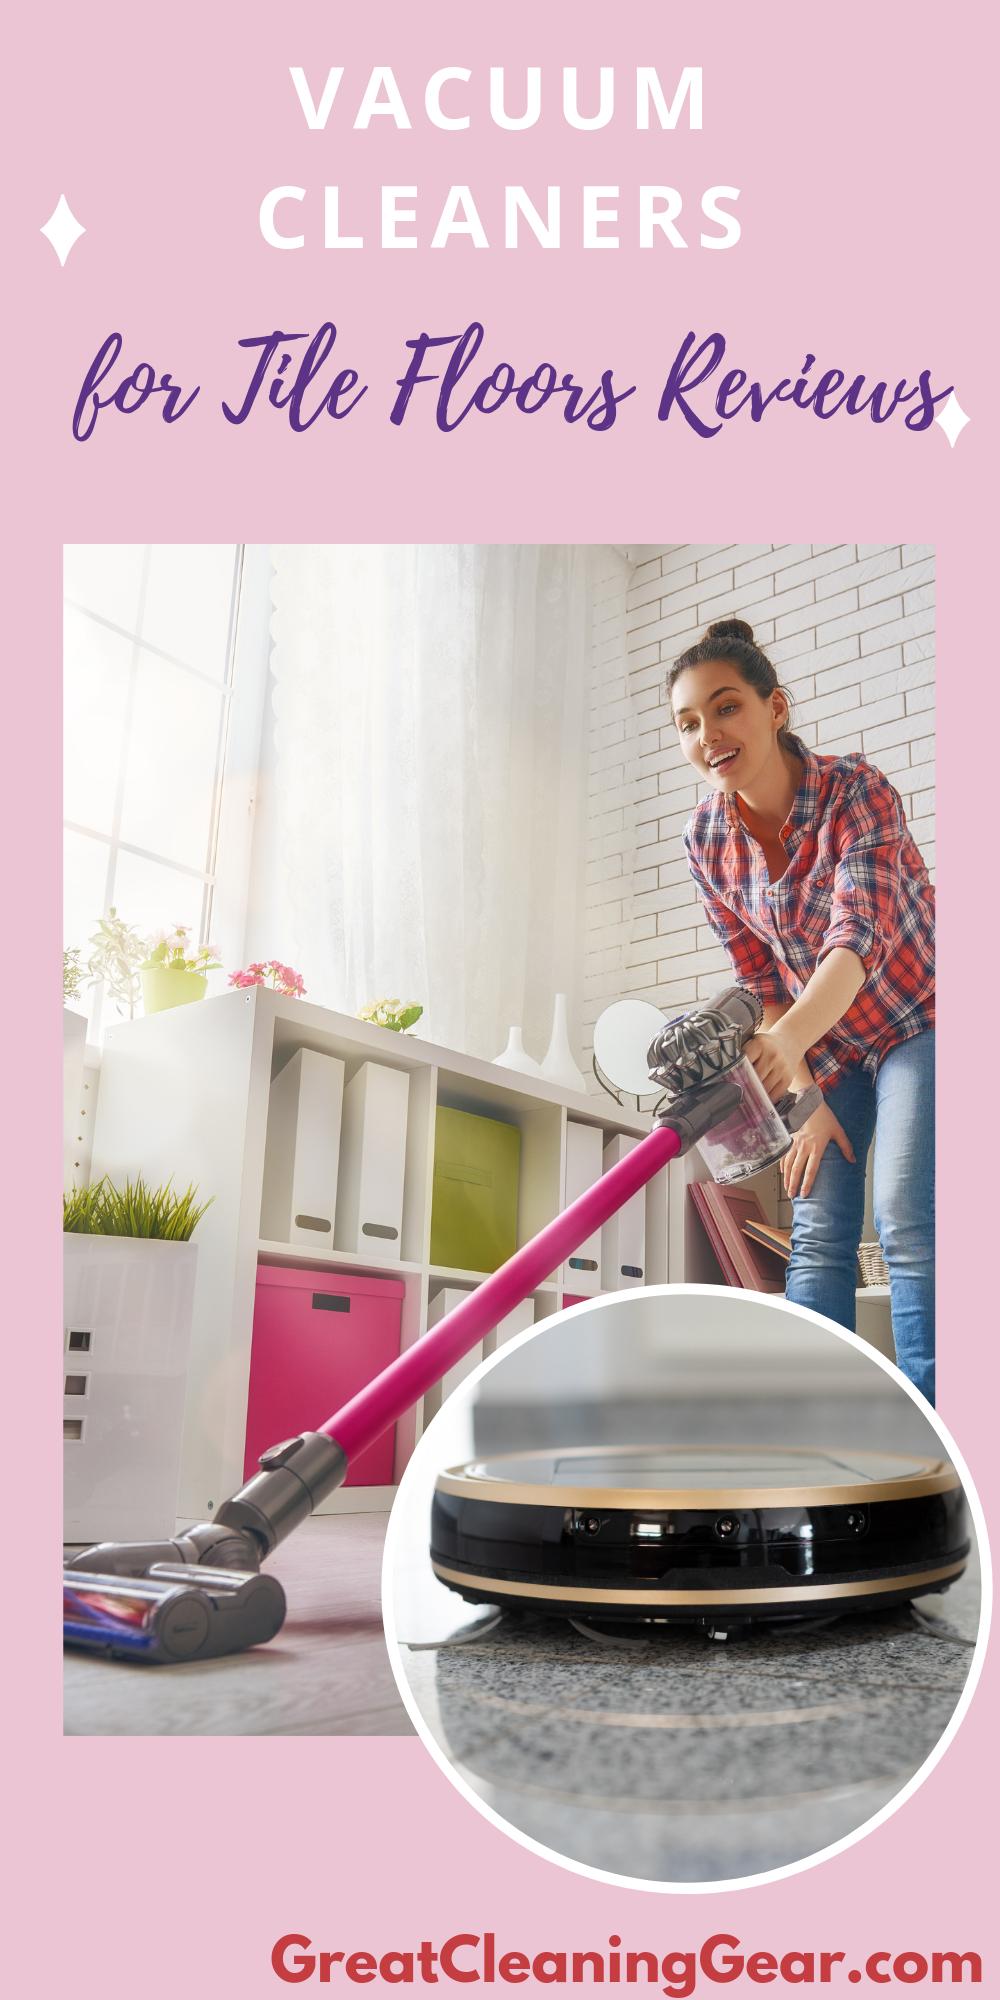 5 Best Vacuums For Tile Floors